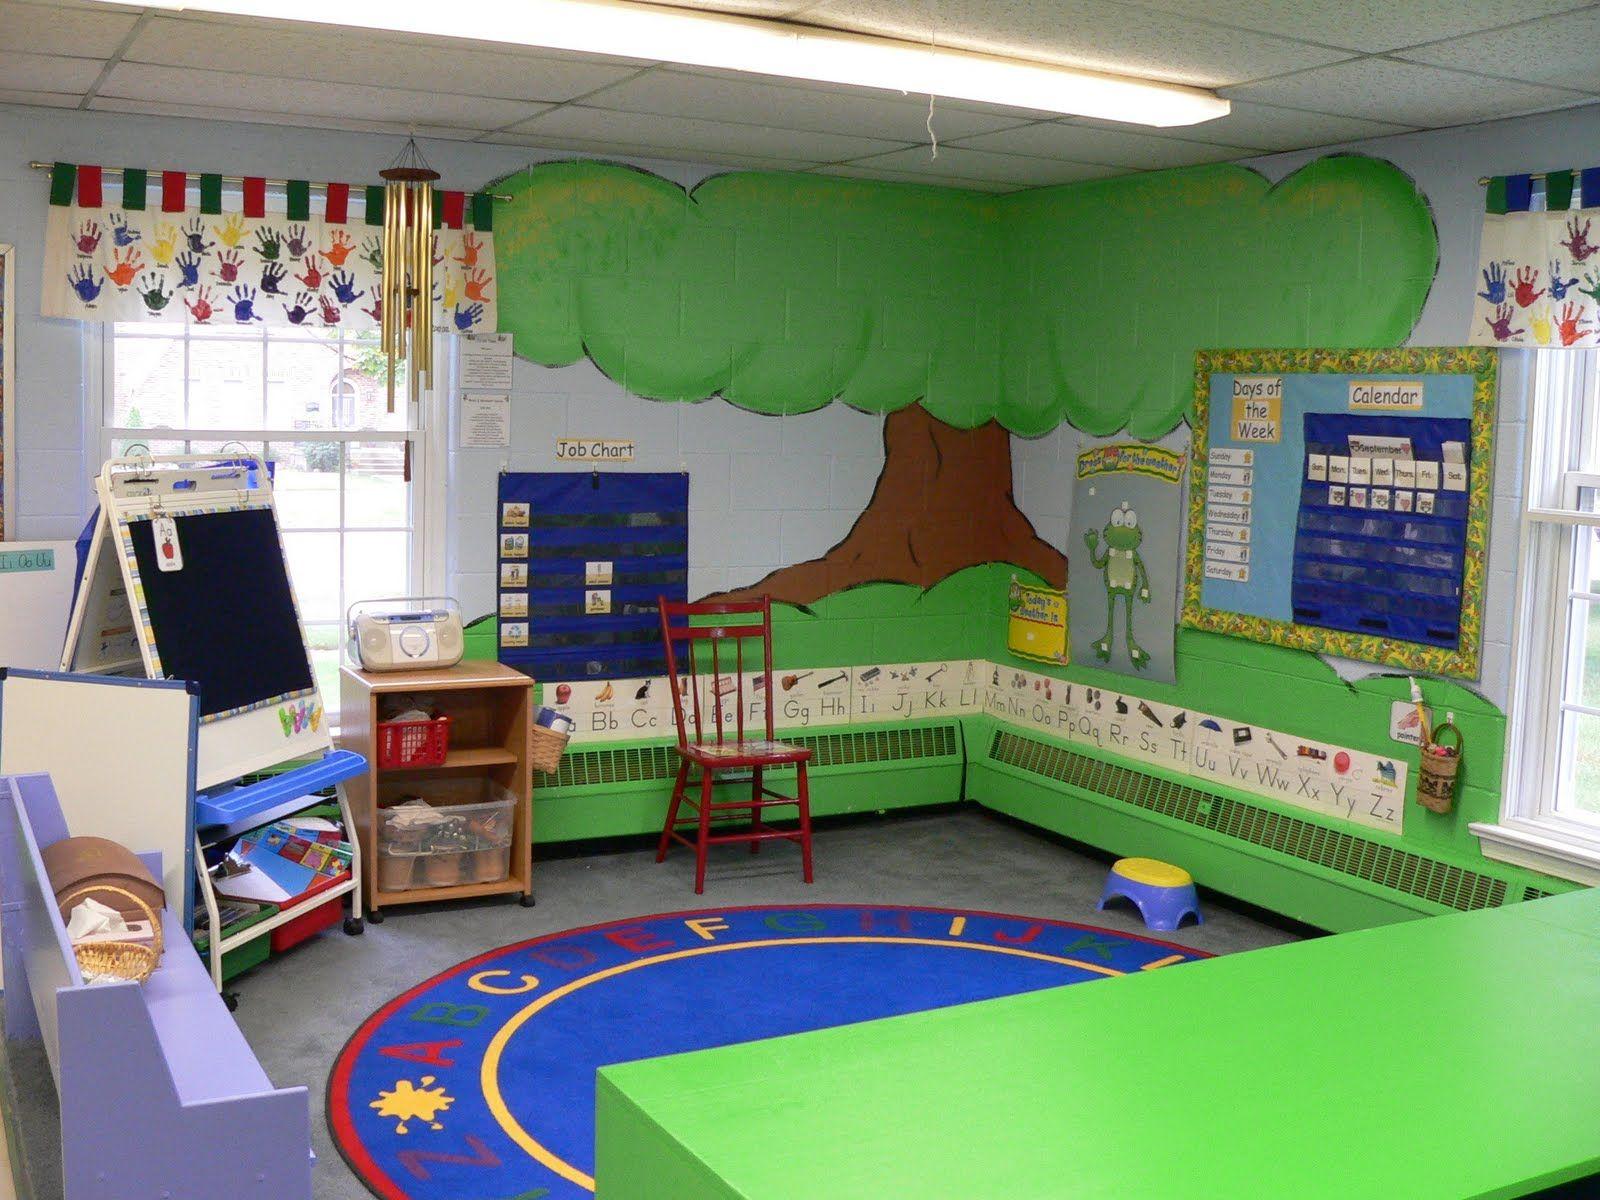 Creative Classroom Decorating Themes Design Ideas And Decor Preschool Classroom Decor Toddler Classroom Diy Classroom Preschool room design ideas